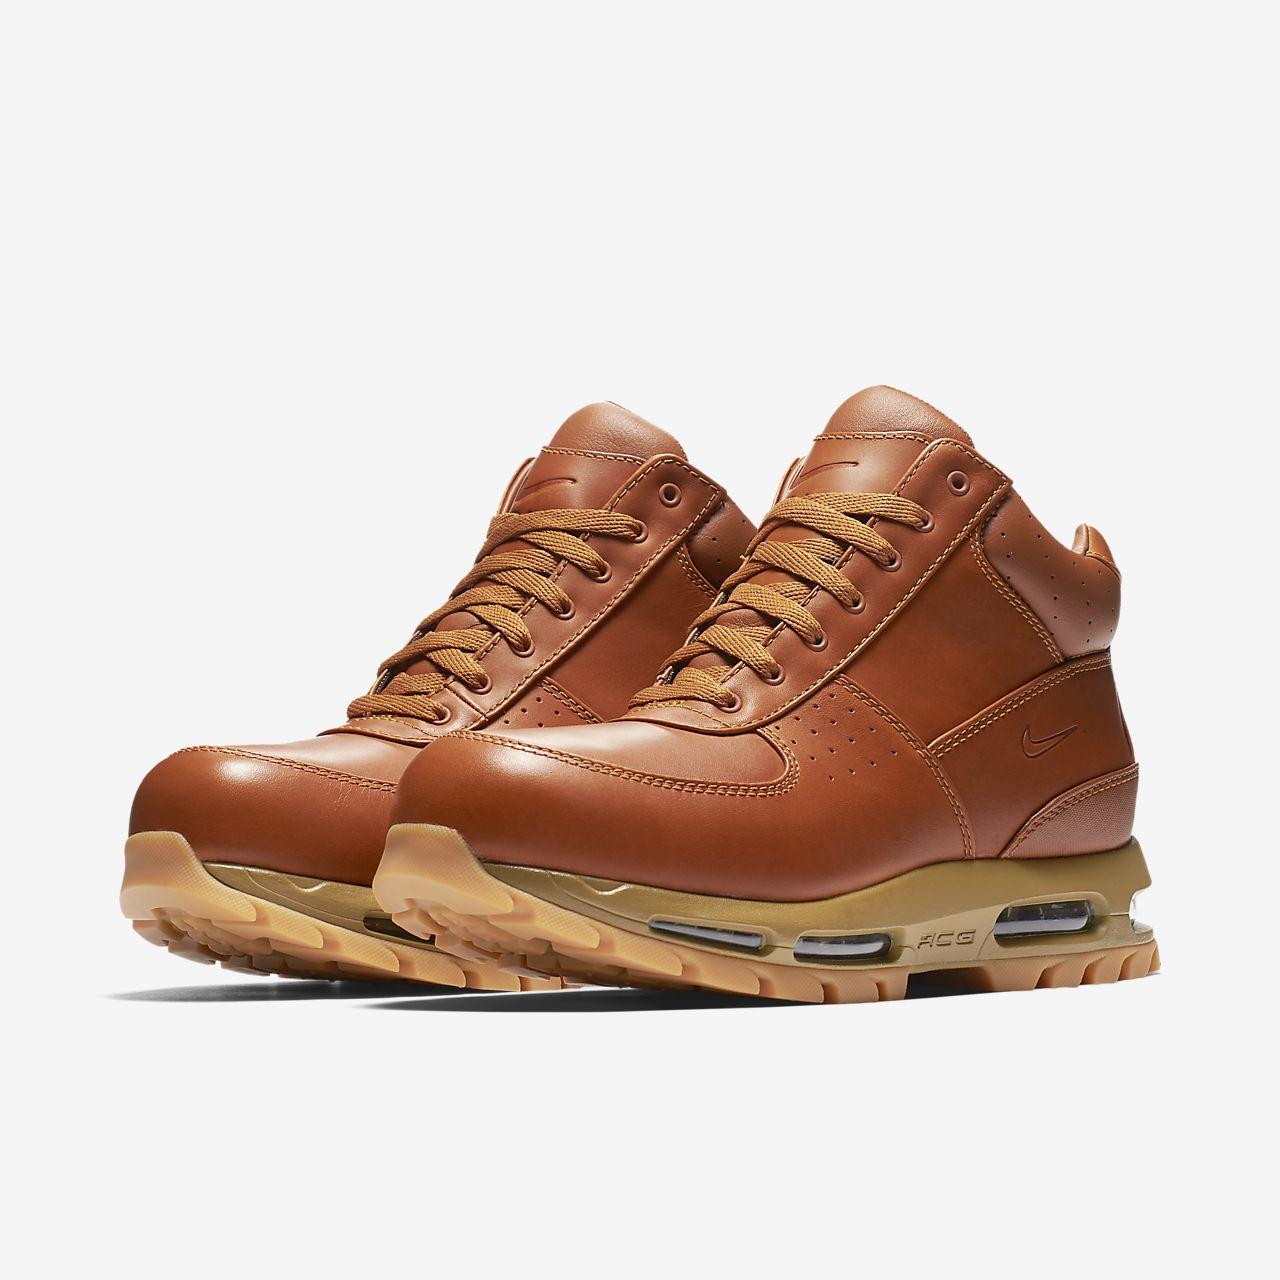 detailed look 63ab6 9e346 ... cut Low Resolution Nike Air Max Goadome Mens Boot Nike Air Max Goadome  Mens Boot .